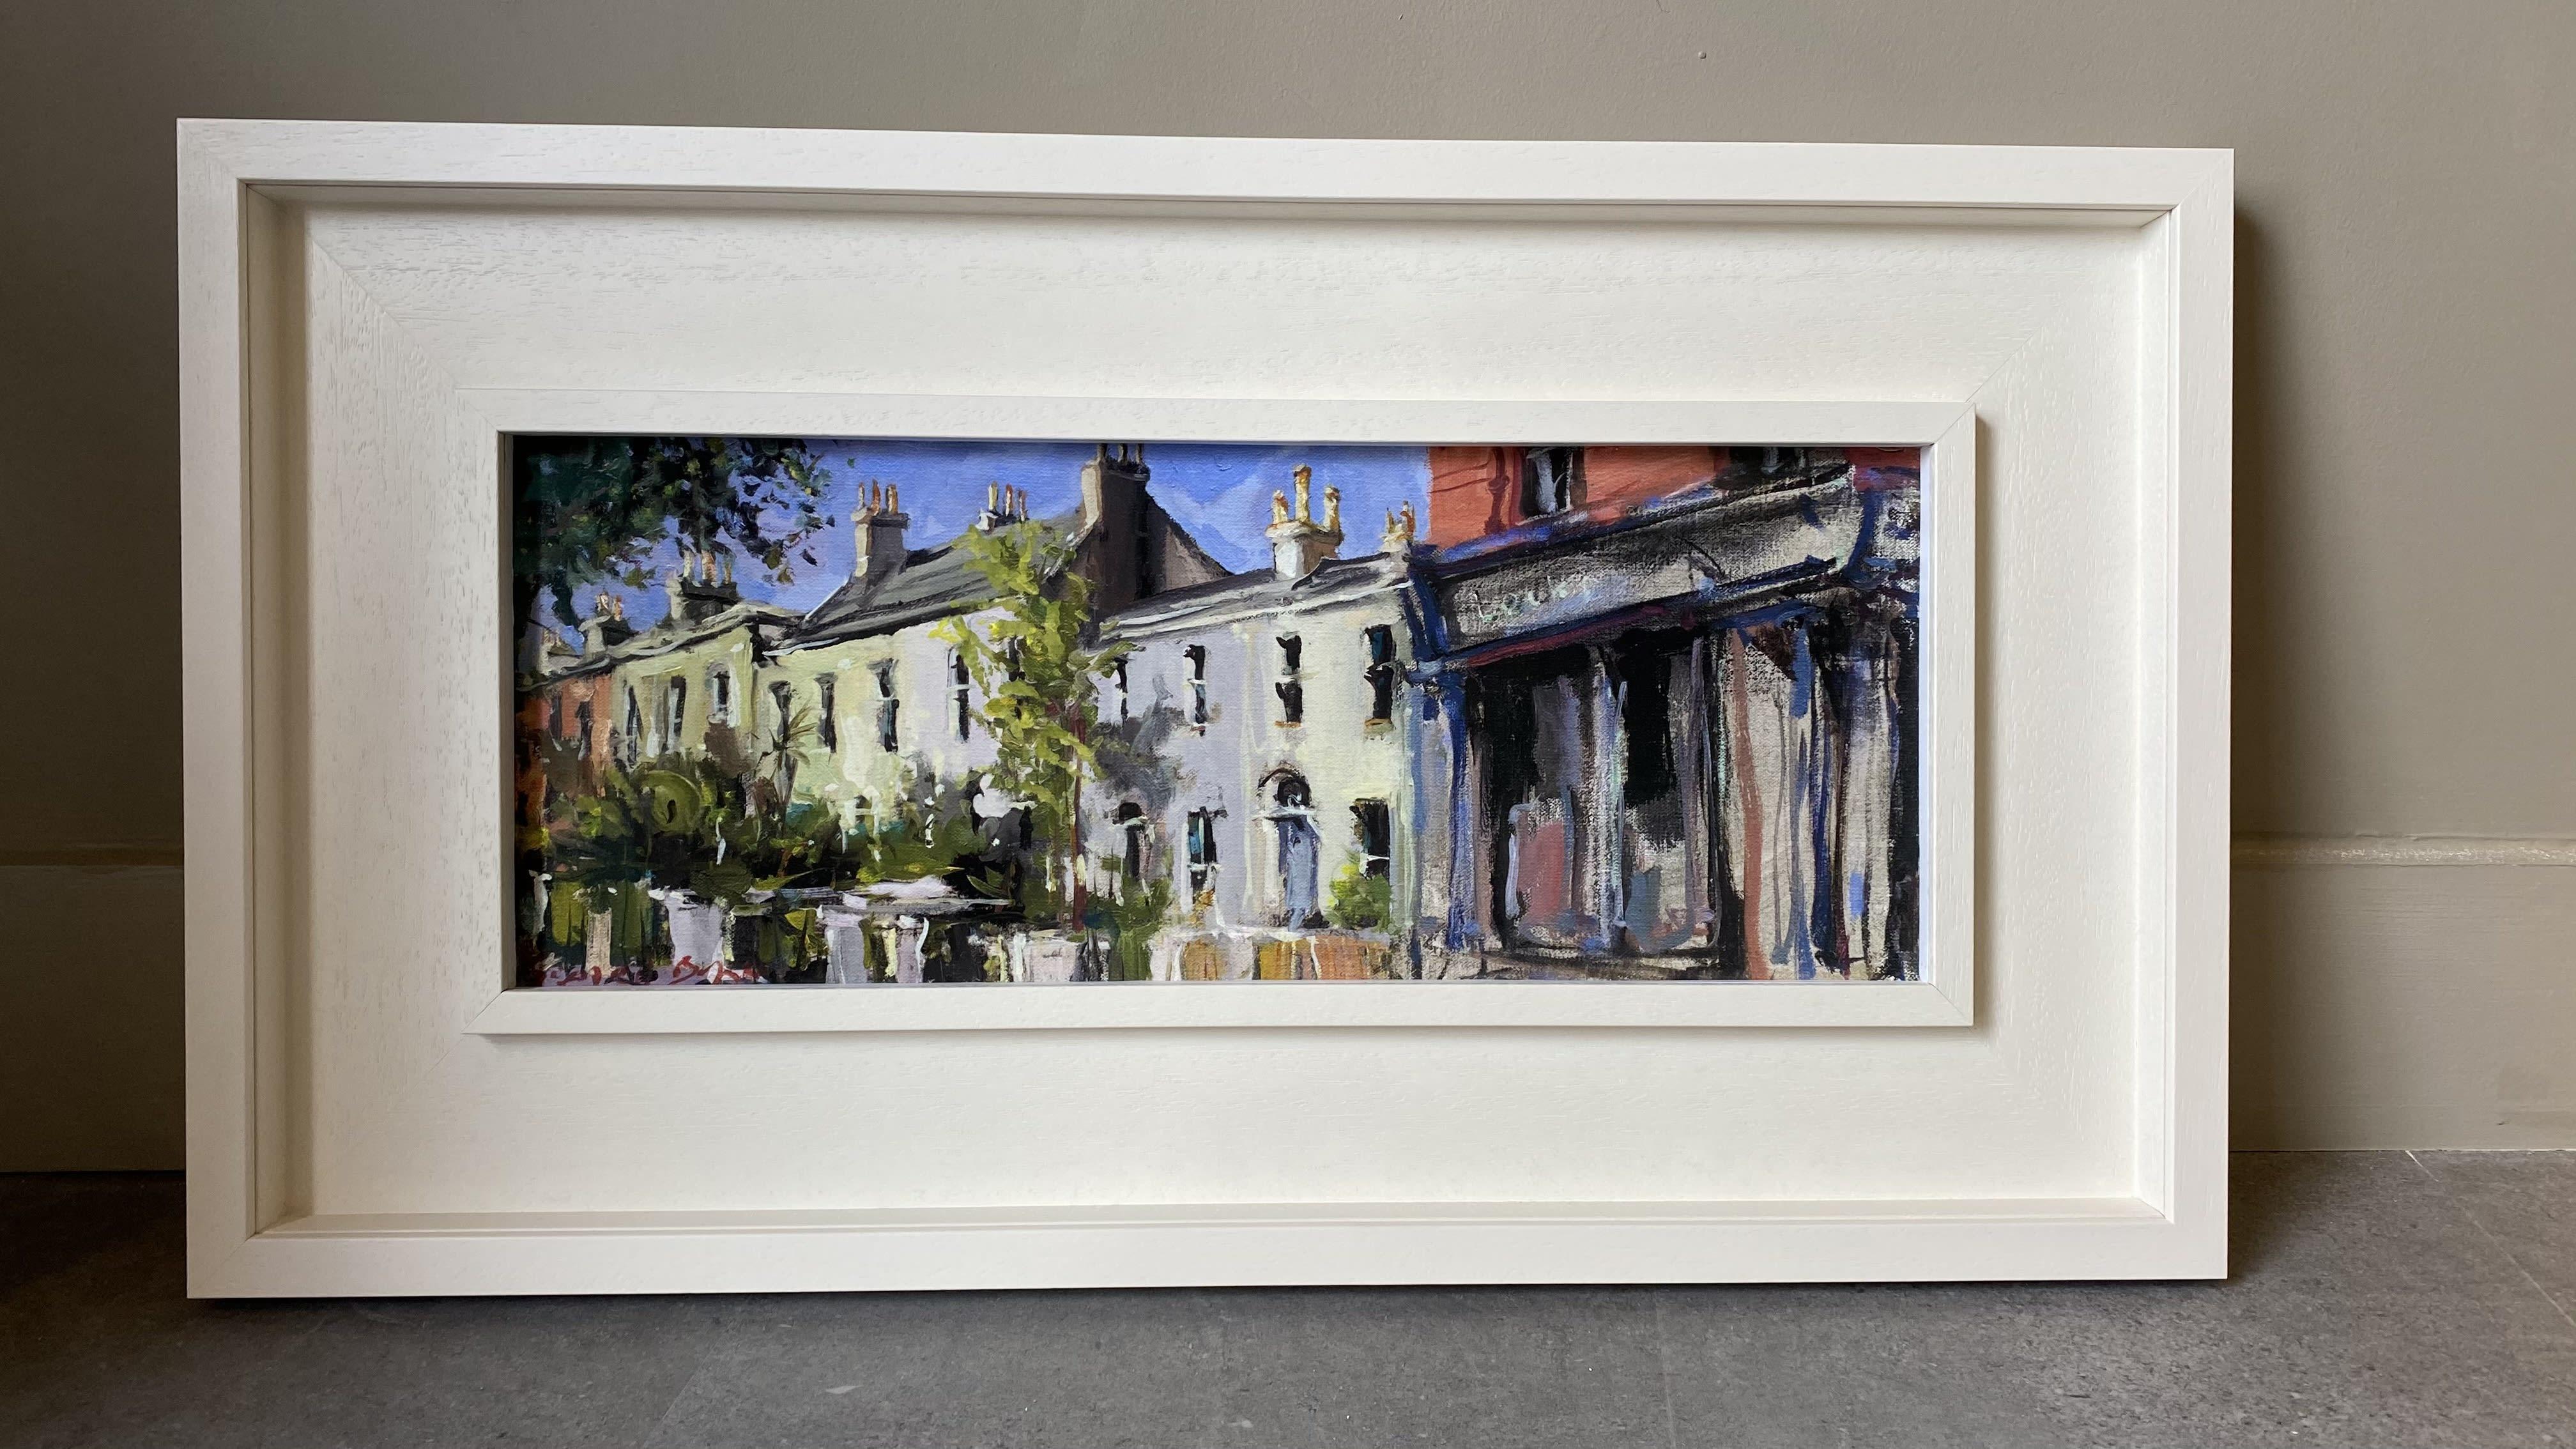 Gerard_Byrne_Blissful_Journey_Fine_Art_Print_Locks_Restuarant_Irish_Art_Gallery